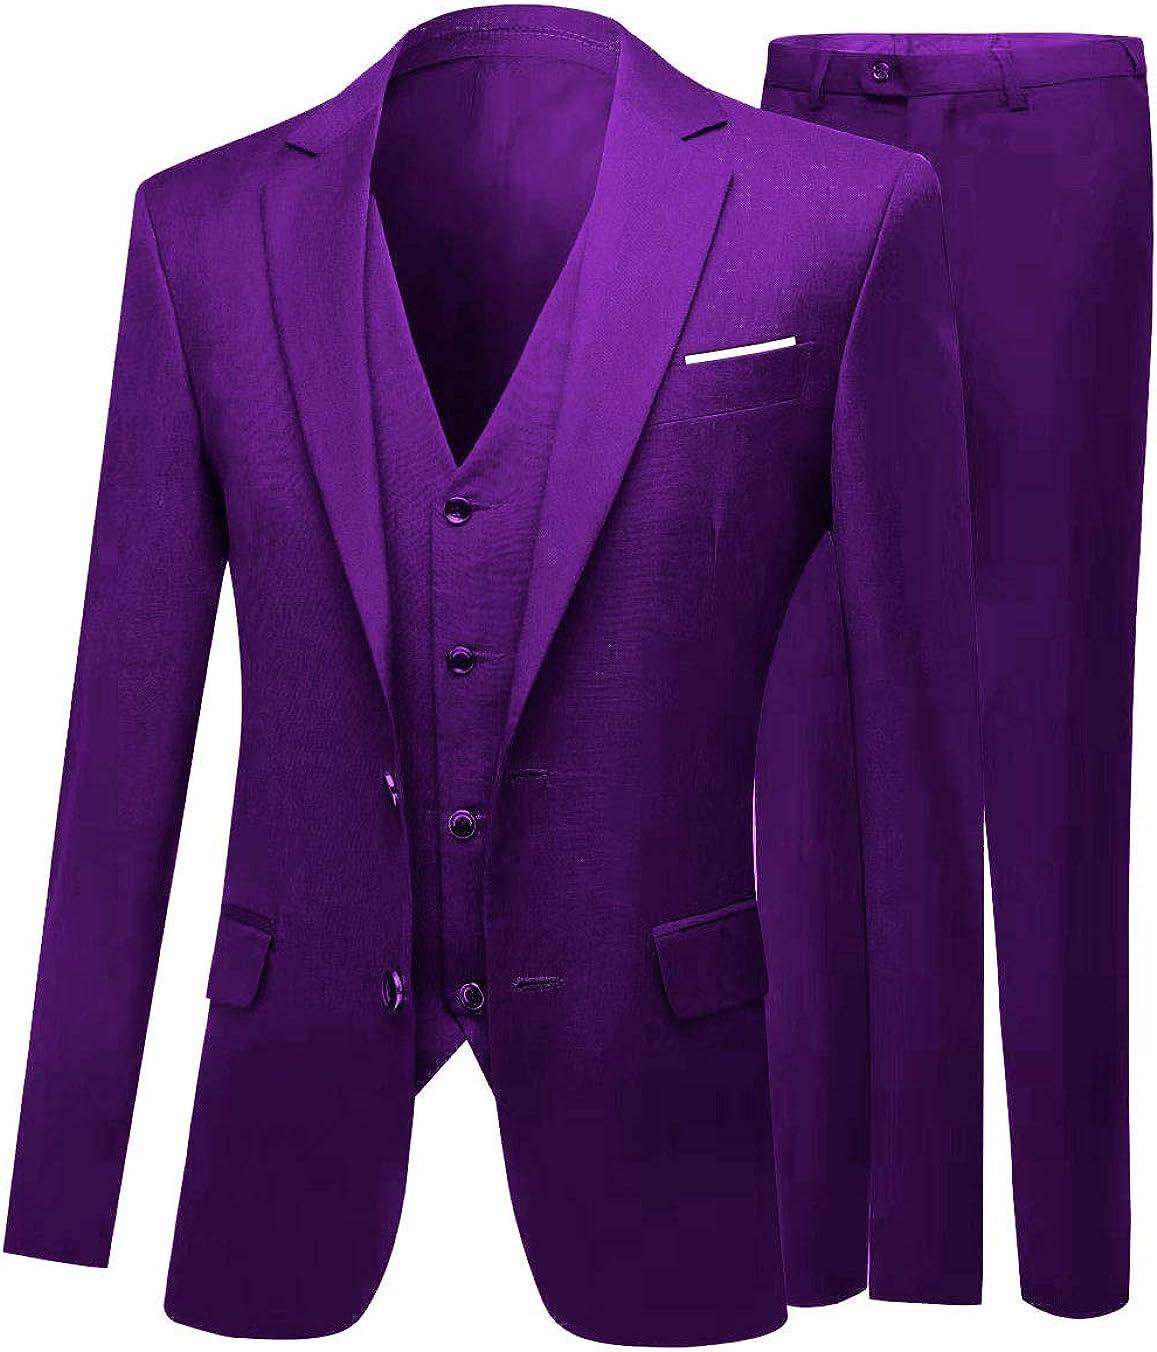 Men's 3 PC Peak Lapel Dark Navy Suits Slim Fit Groom Tuxedos Wedding Suits